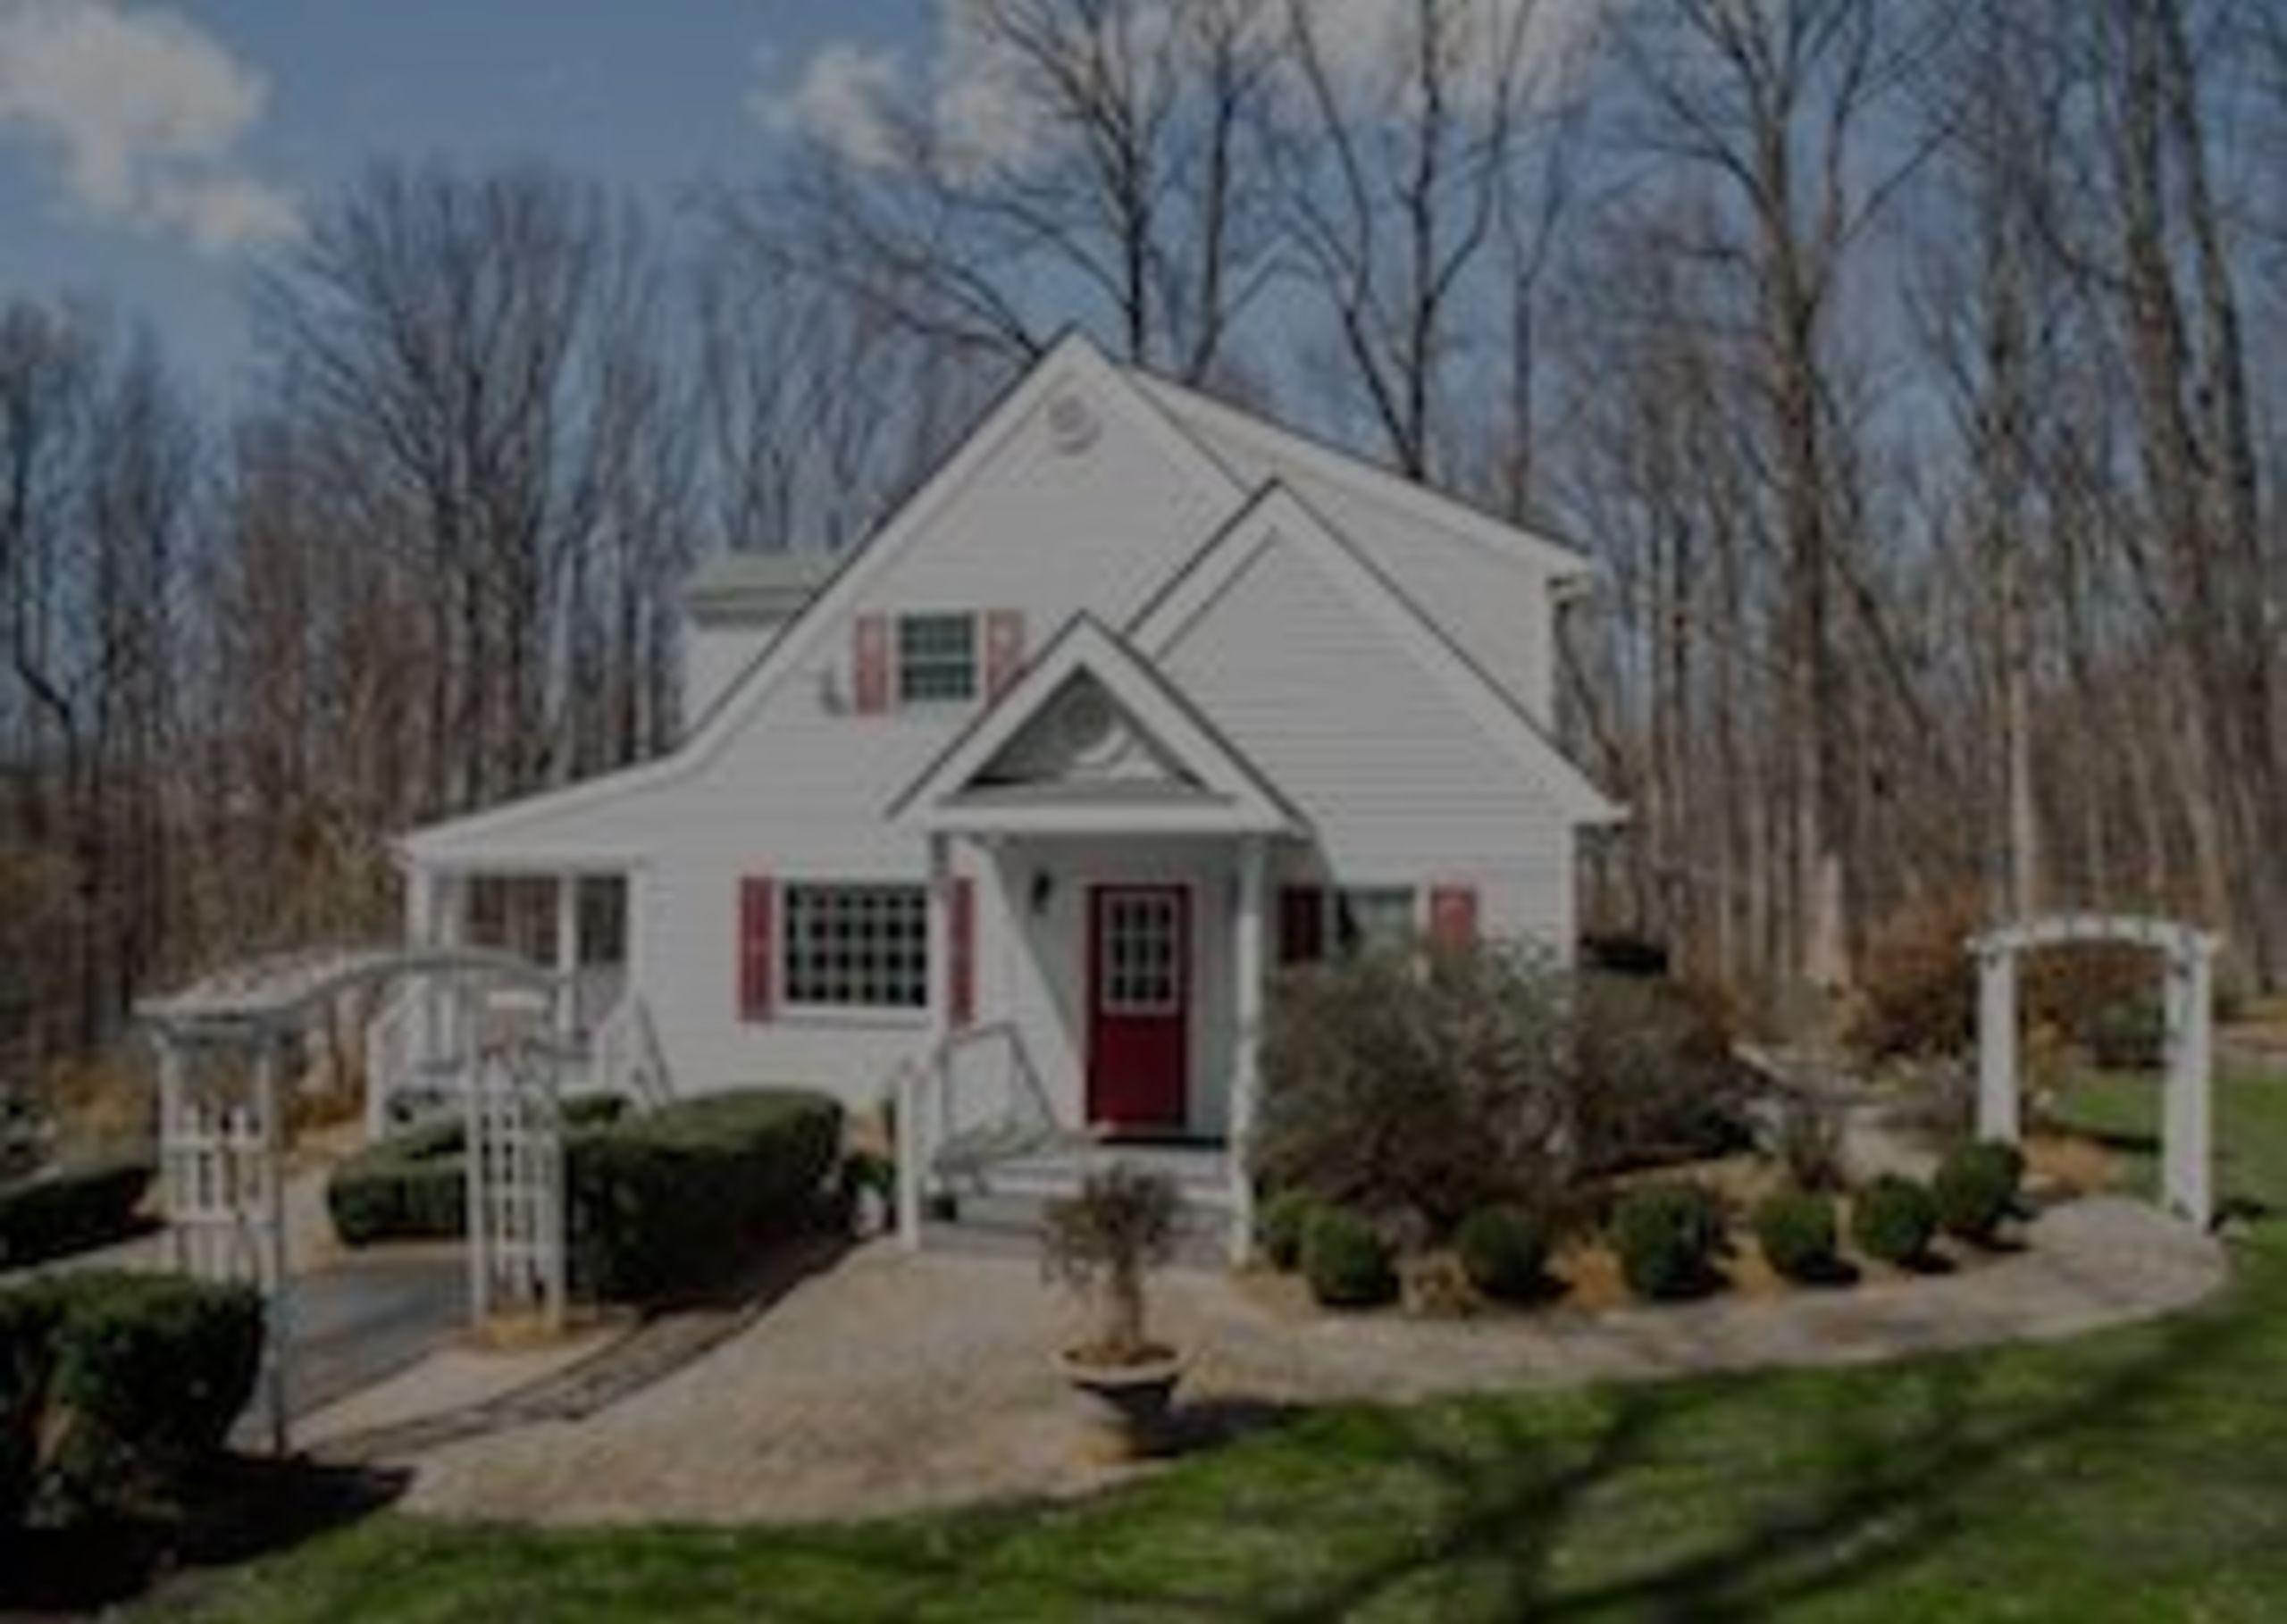 Open Houses   6/30-7/1 in Loudoun, Clarke, Fauquier, Fairfax & Jefferson